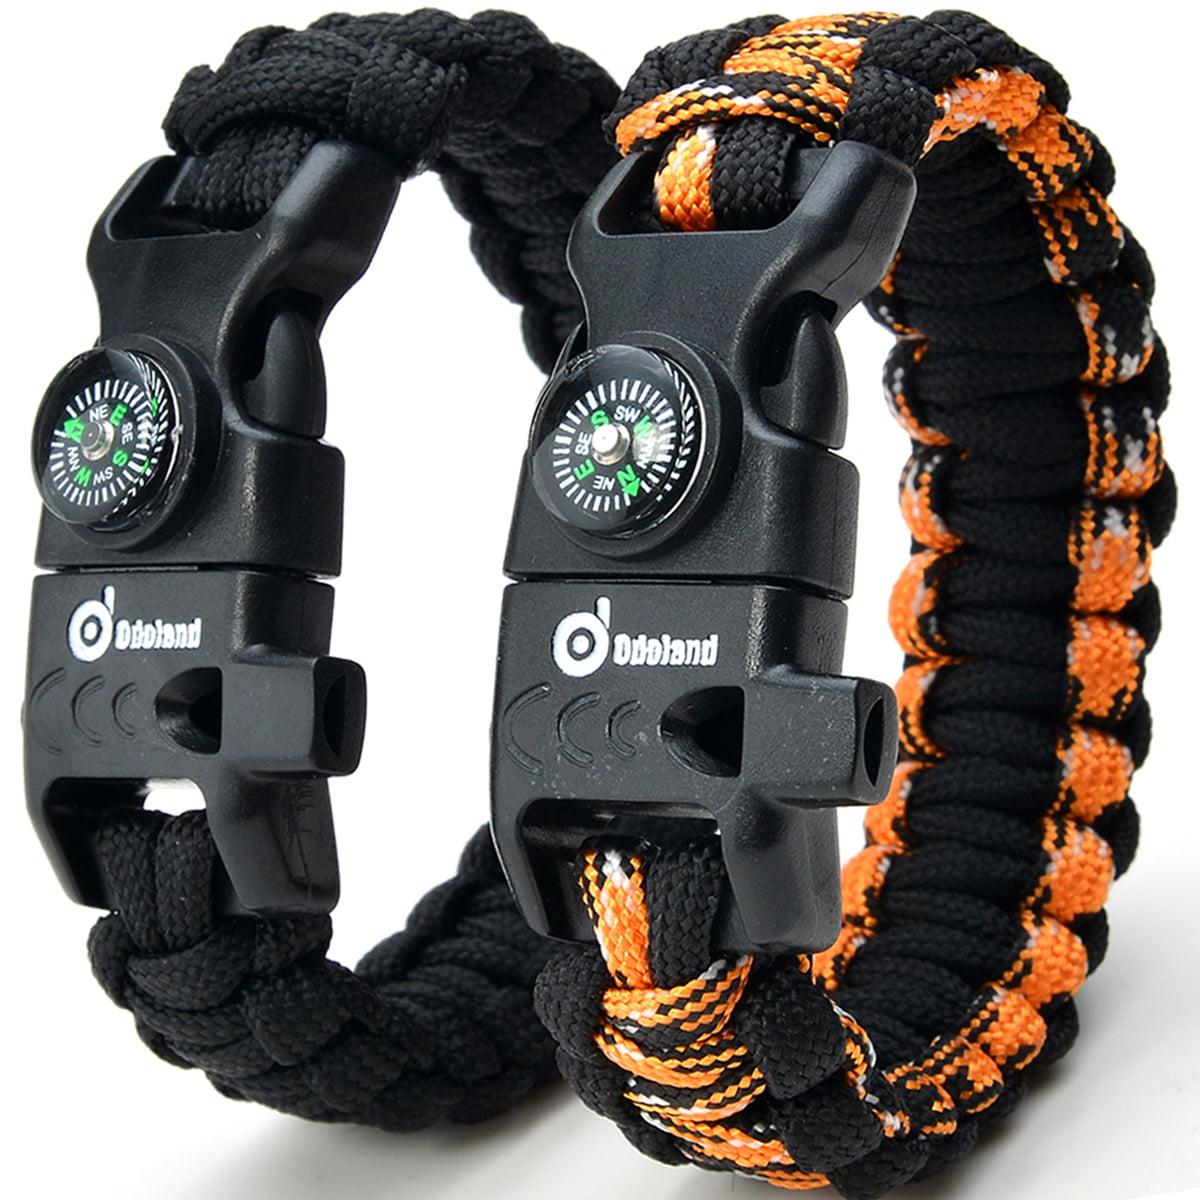 ODOLAND Paracord Bracelet Emergency Survival Cord 2-Peak Series Gear Kit w/ Compass Fire Starter Knife Whistle